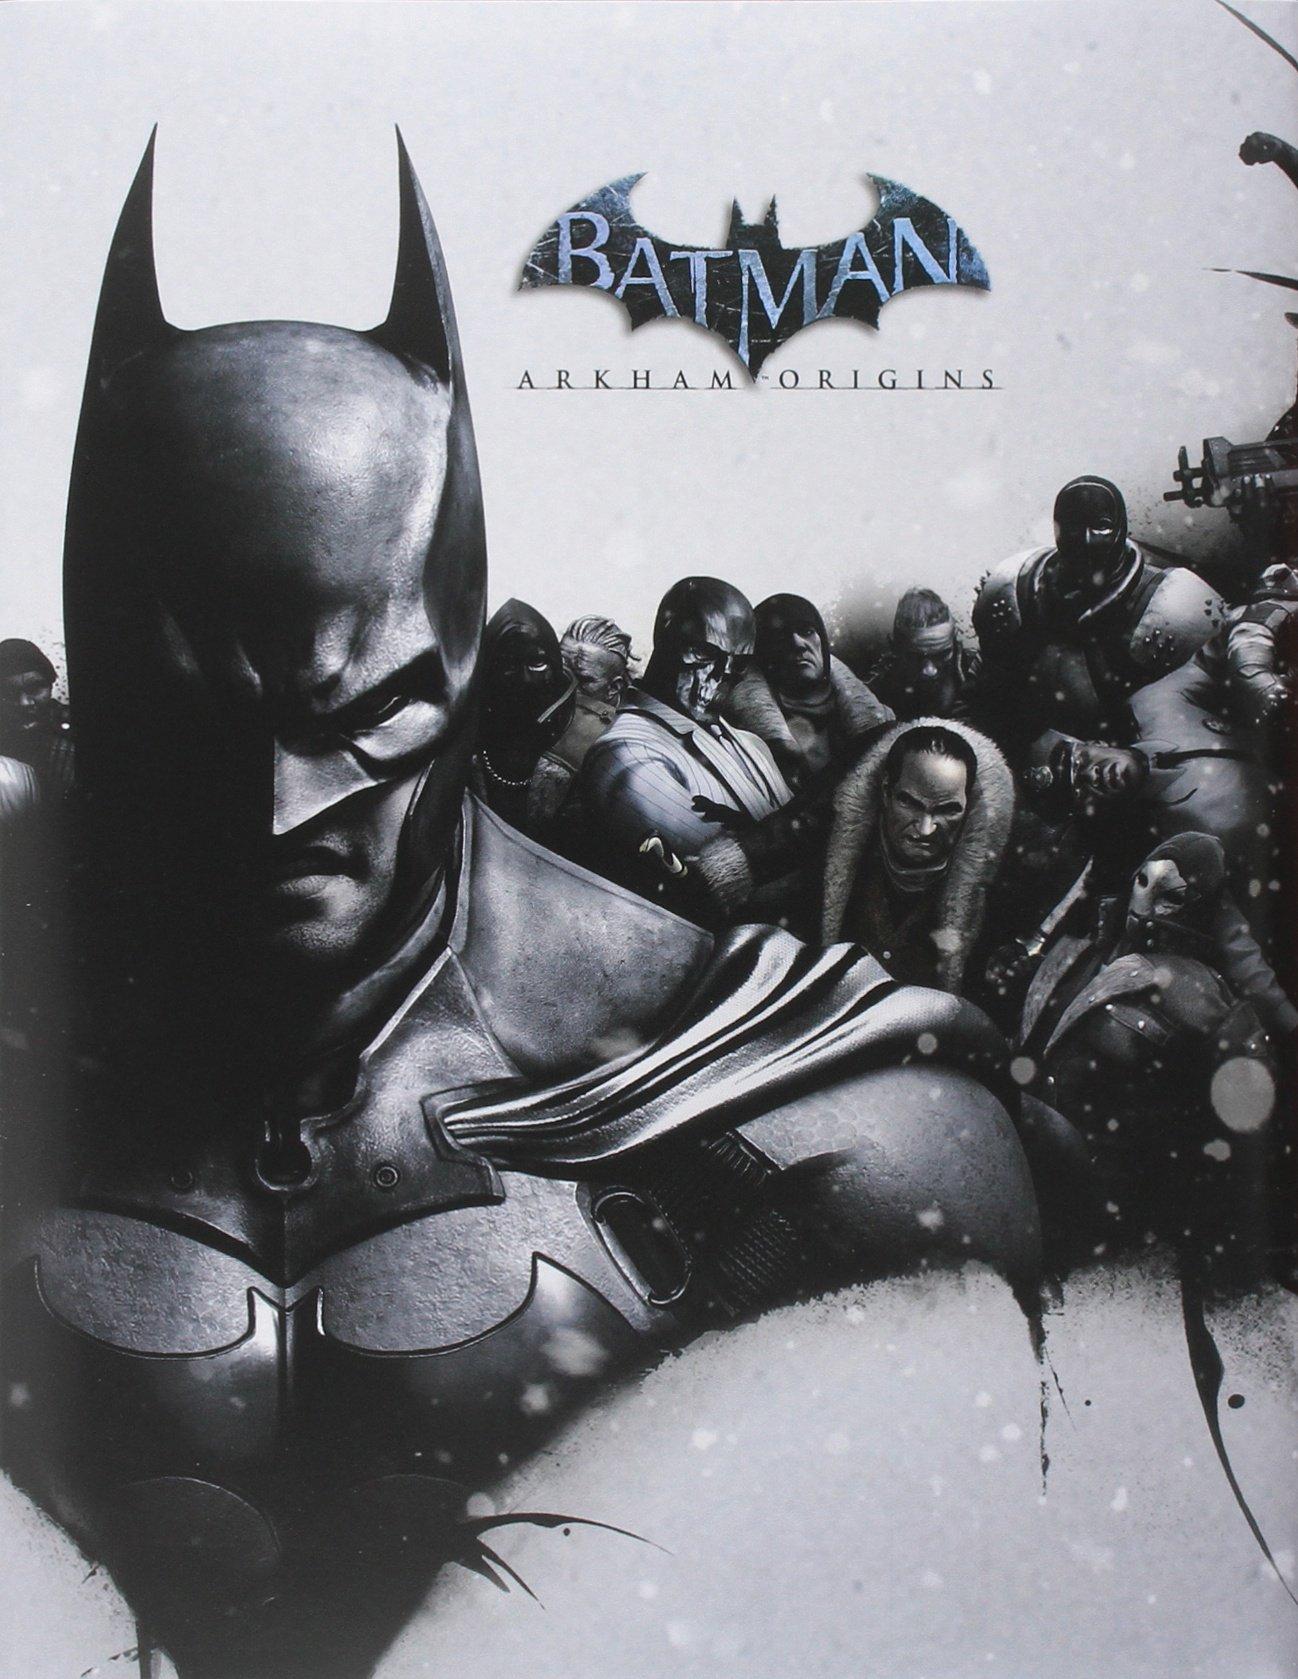 Batman Arkham Origins Limited Edition Strategy Guide Brady Games Amazoncouk BradyGames 8601419794638 Books